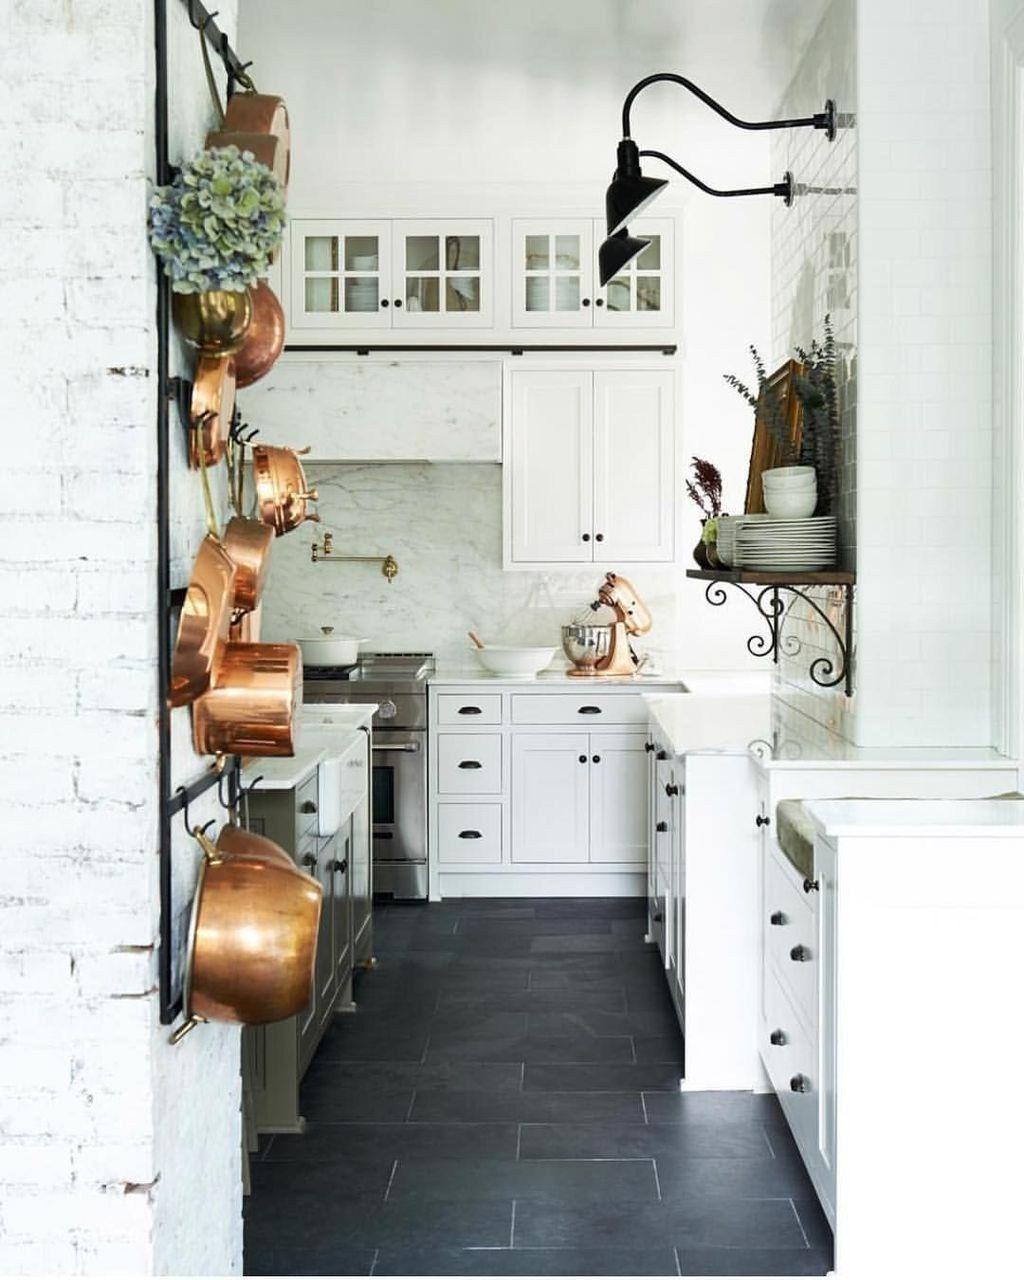 35 stunning small farmhouse kitchen decor ideas best for on best farmhouse kitchen decor ideas and remodel create your dreams id=97691